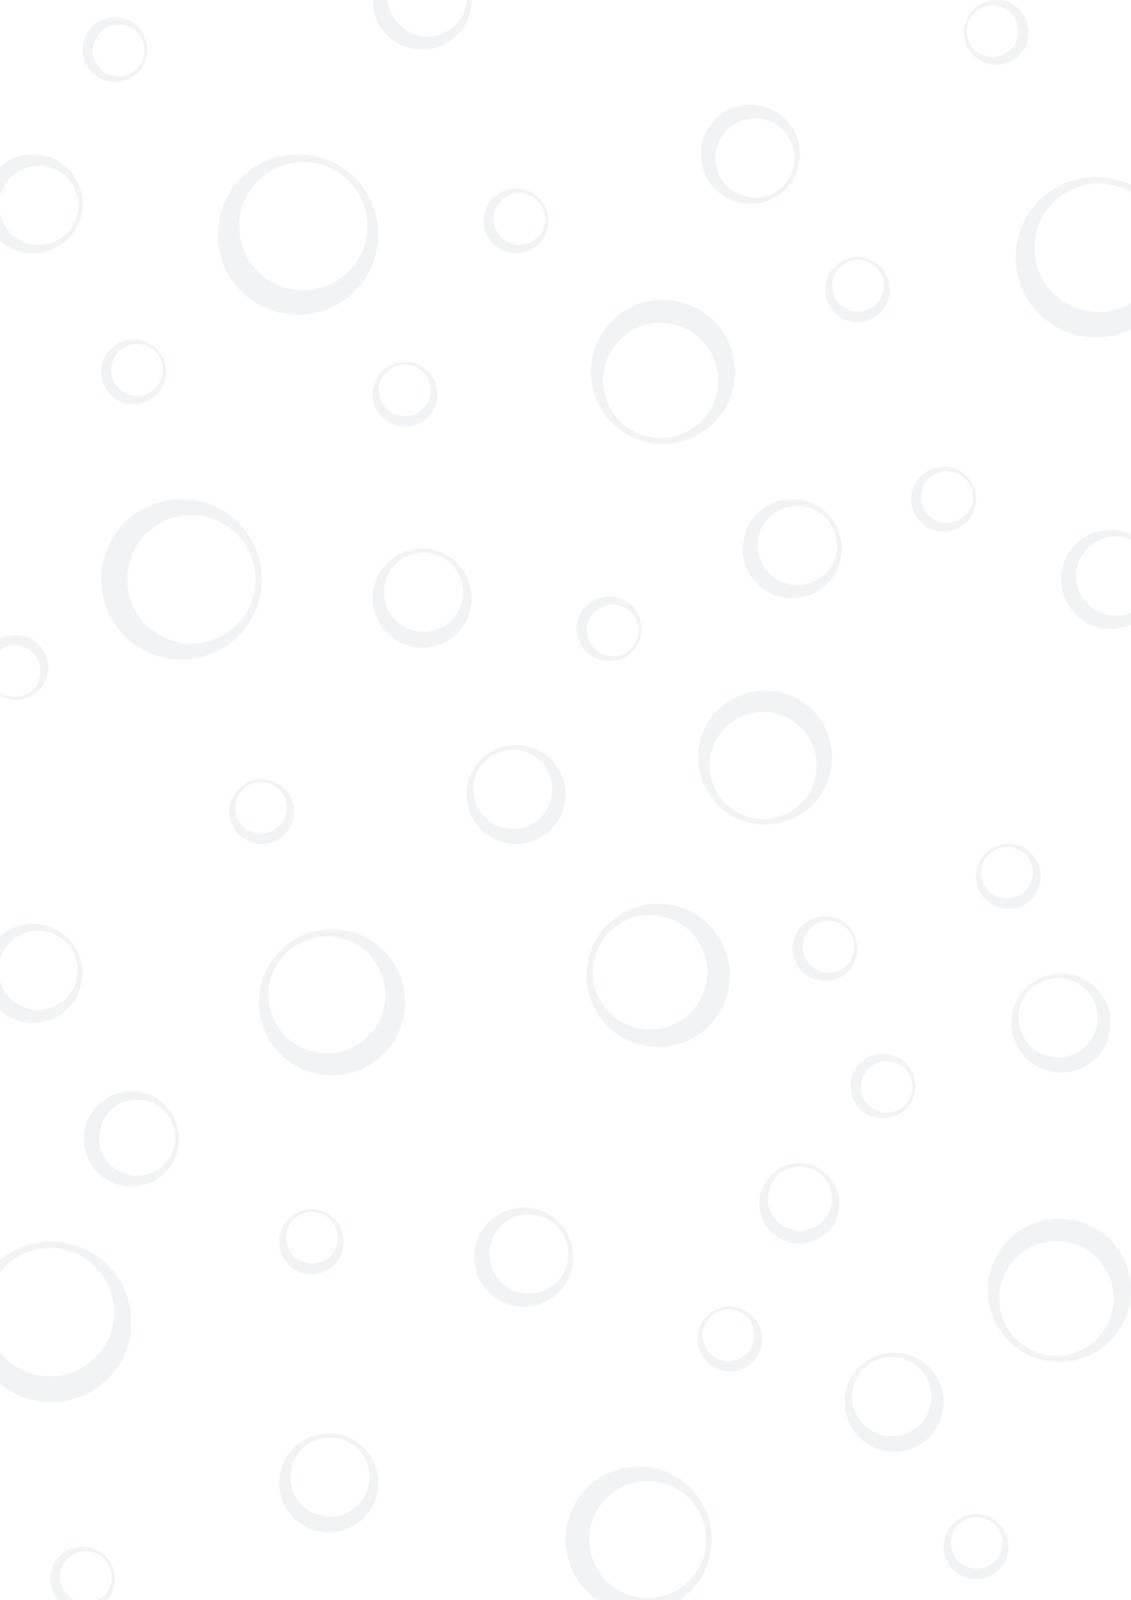 classic modern style of ring sponge backdrop on white background